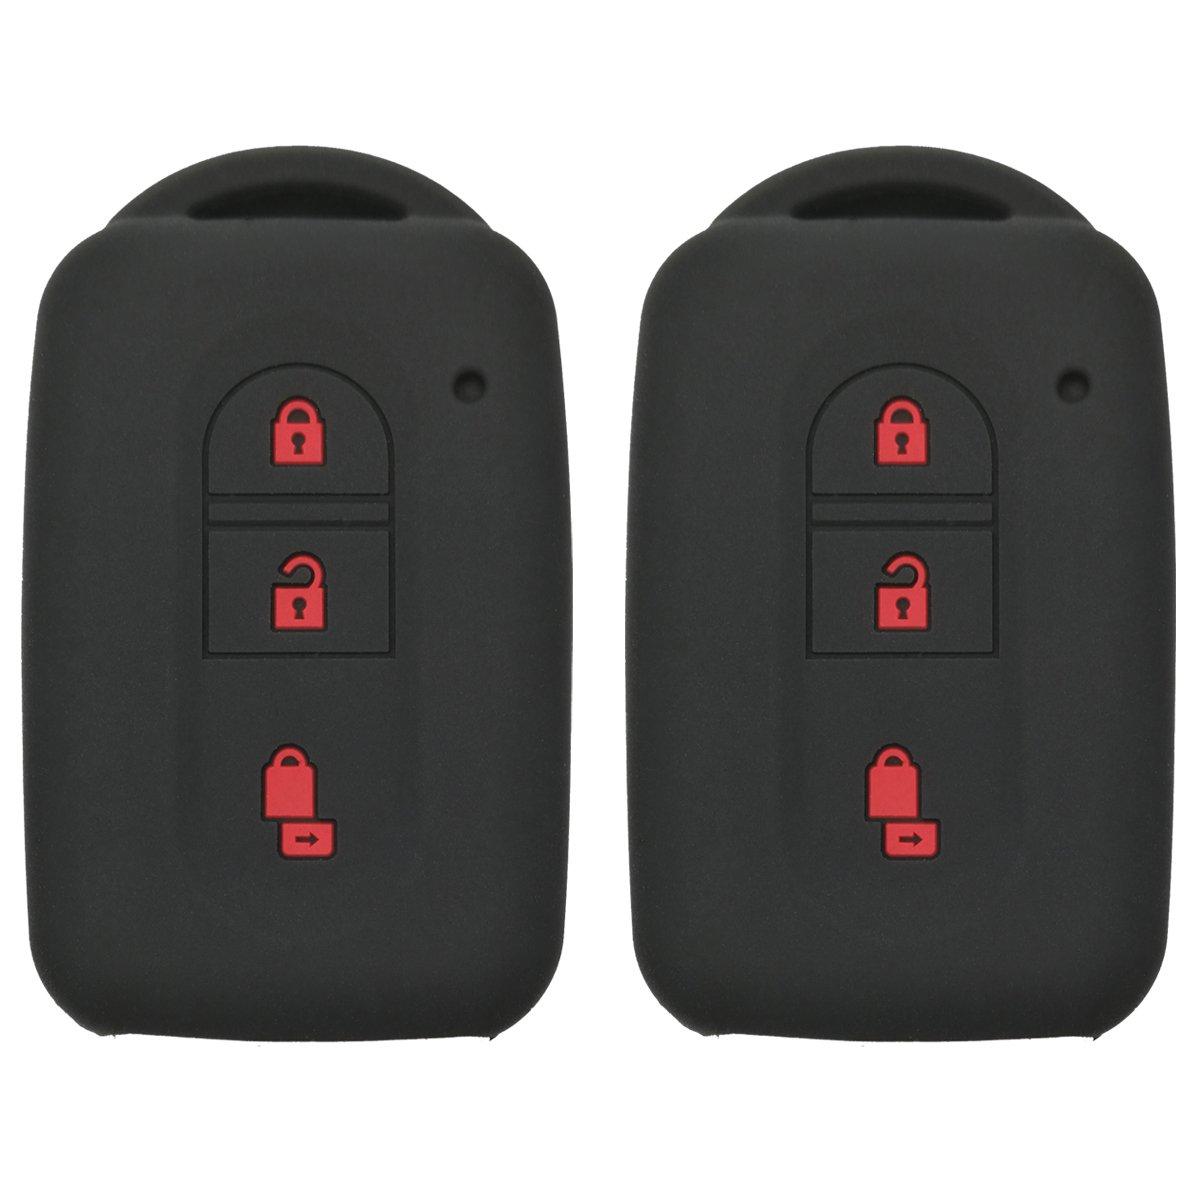 Coolbestda silicone 3 pulsanti Smart Key Fob Protector case senza telecomando giacca per Nissan Tiida note Navara Qashqai Micra Juke X-Trail Pathfinder